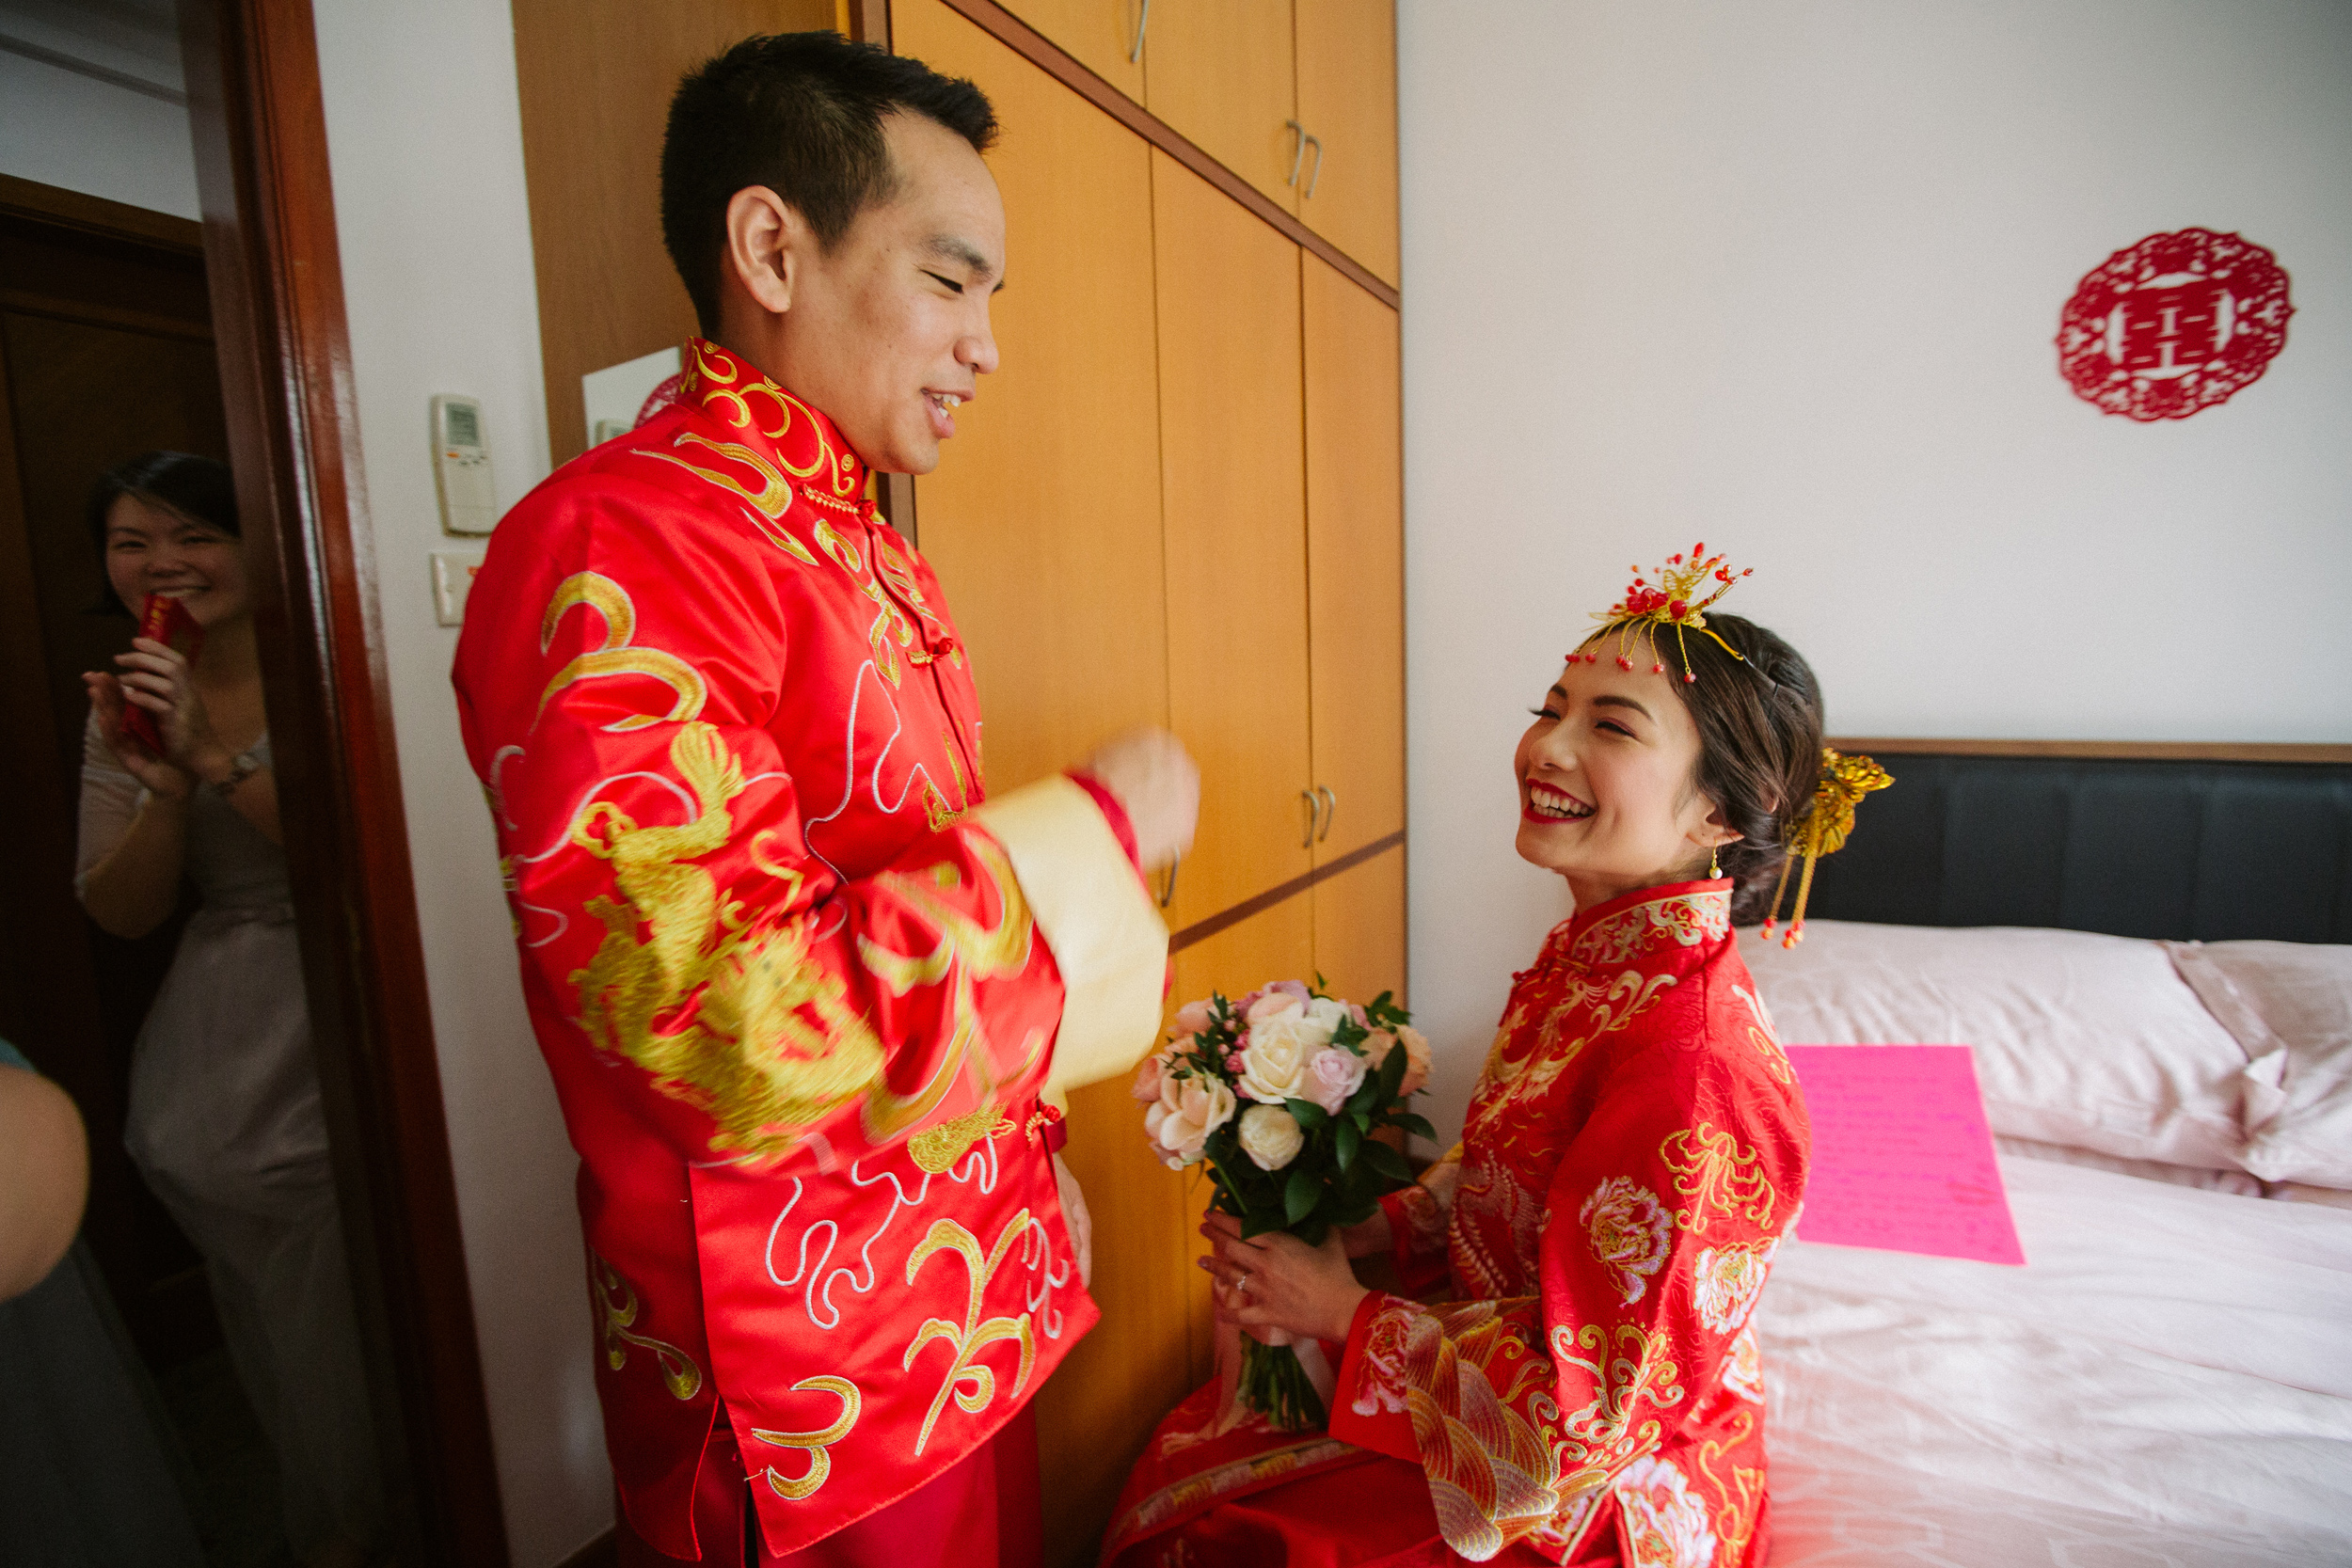 singapore-wedding-photographer-cheryl-matthew-fullerton-hotel-wedding-25.jpg